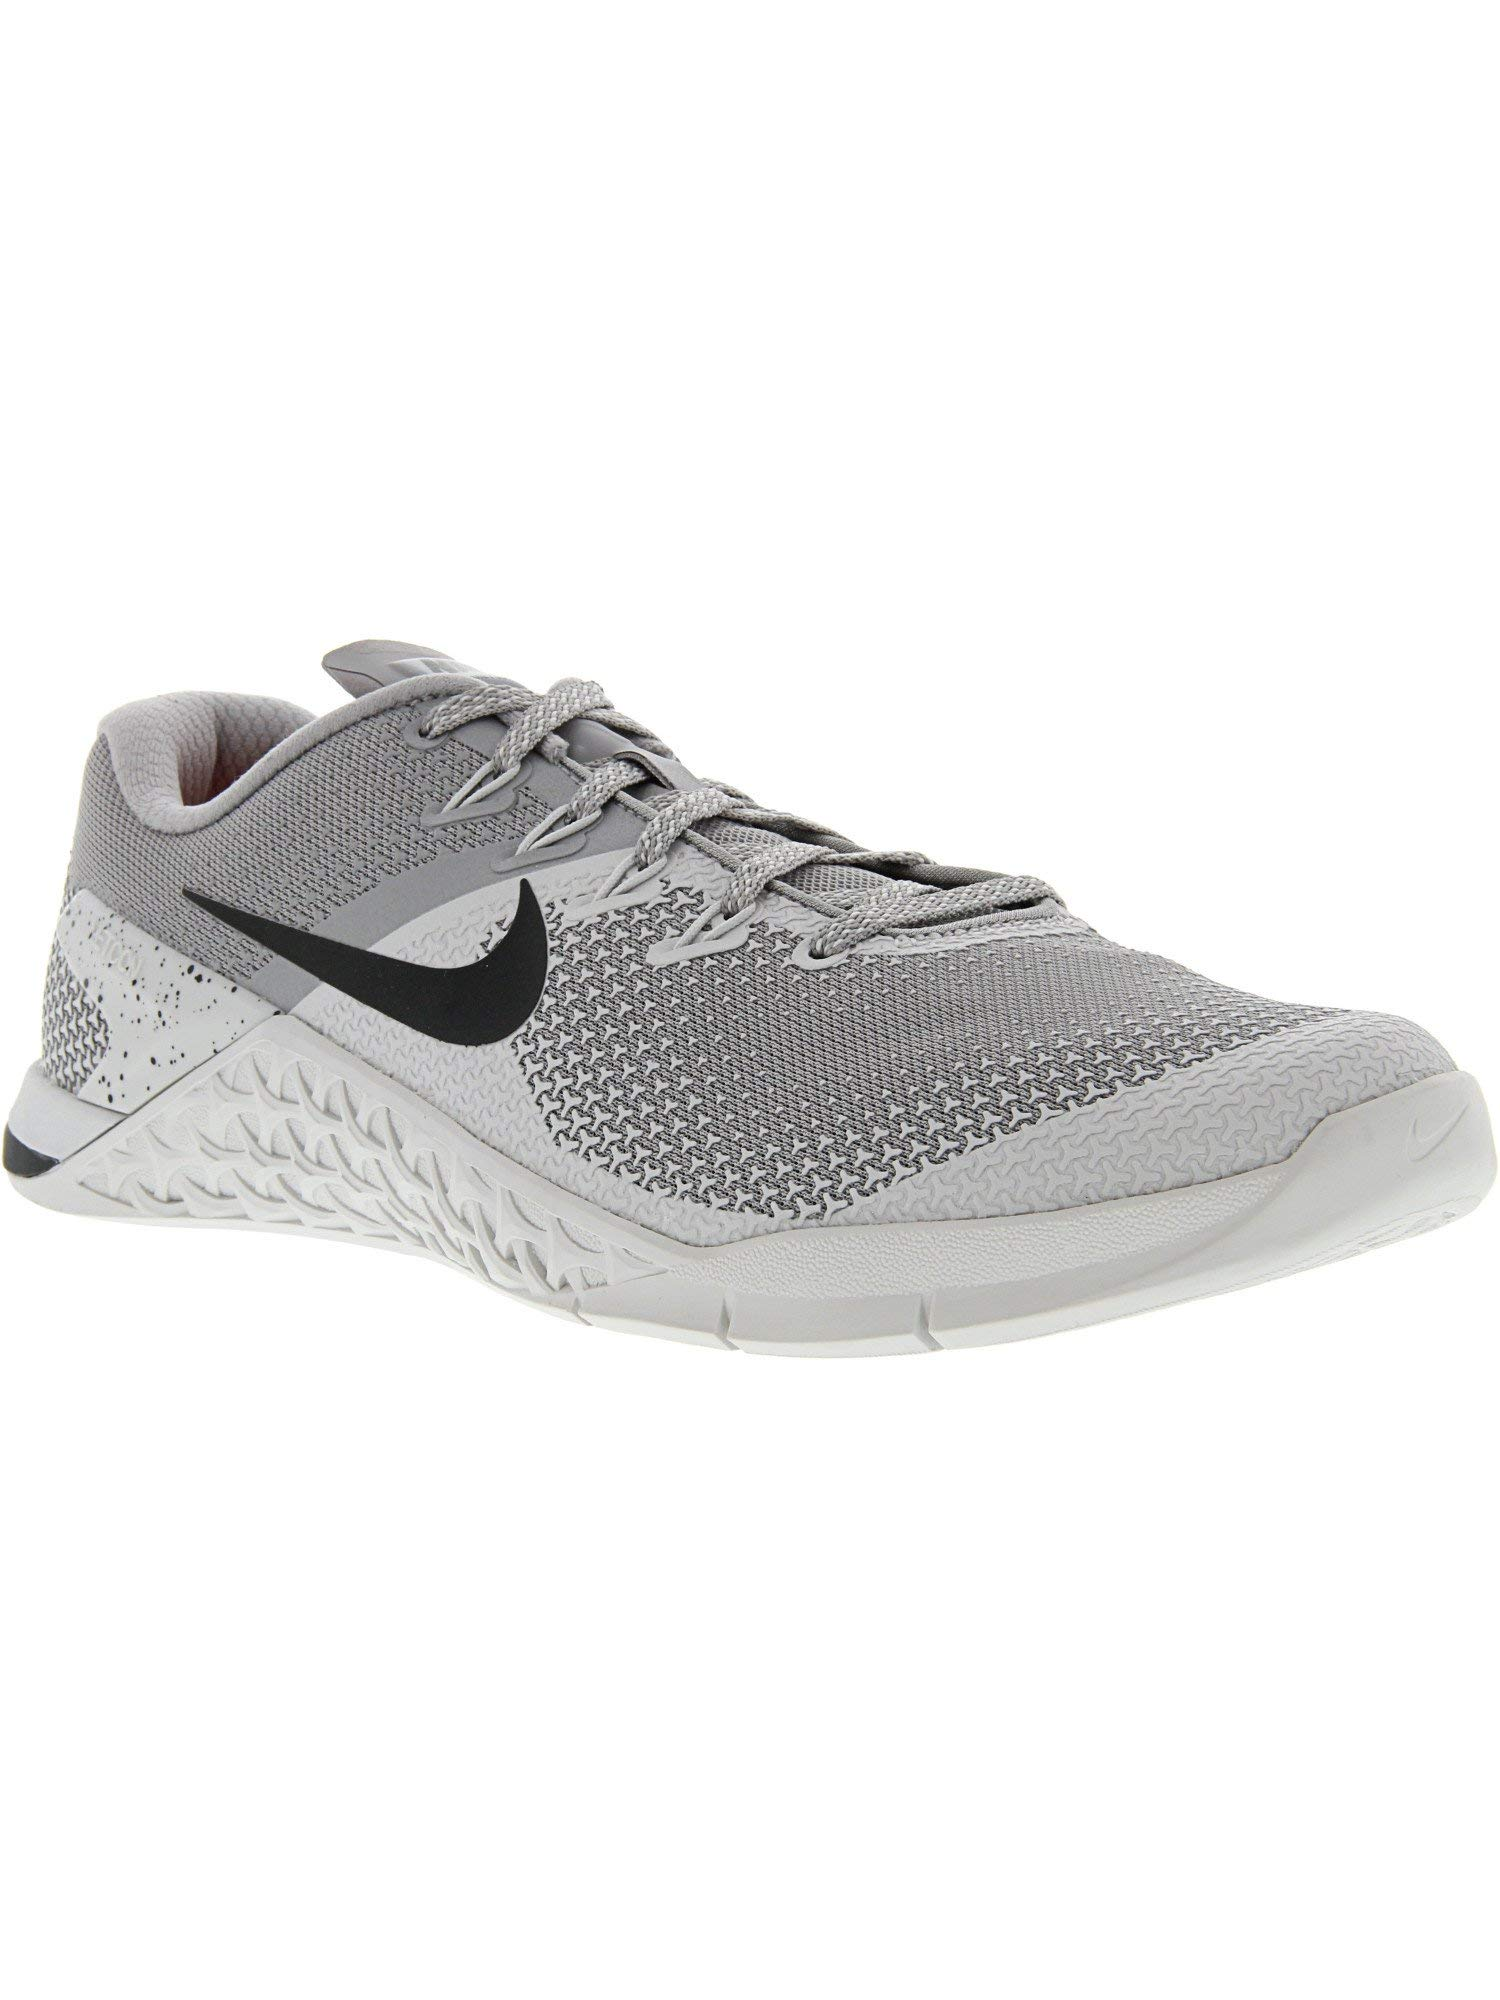 Nike Men's Metcon 4 Atmosphere Grey/Black Ankle-High Cross Trainer Shoe - 7M by Nike (Image #3)